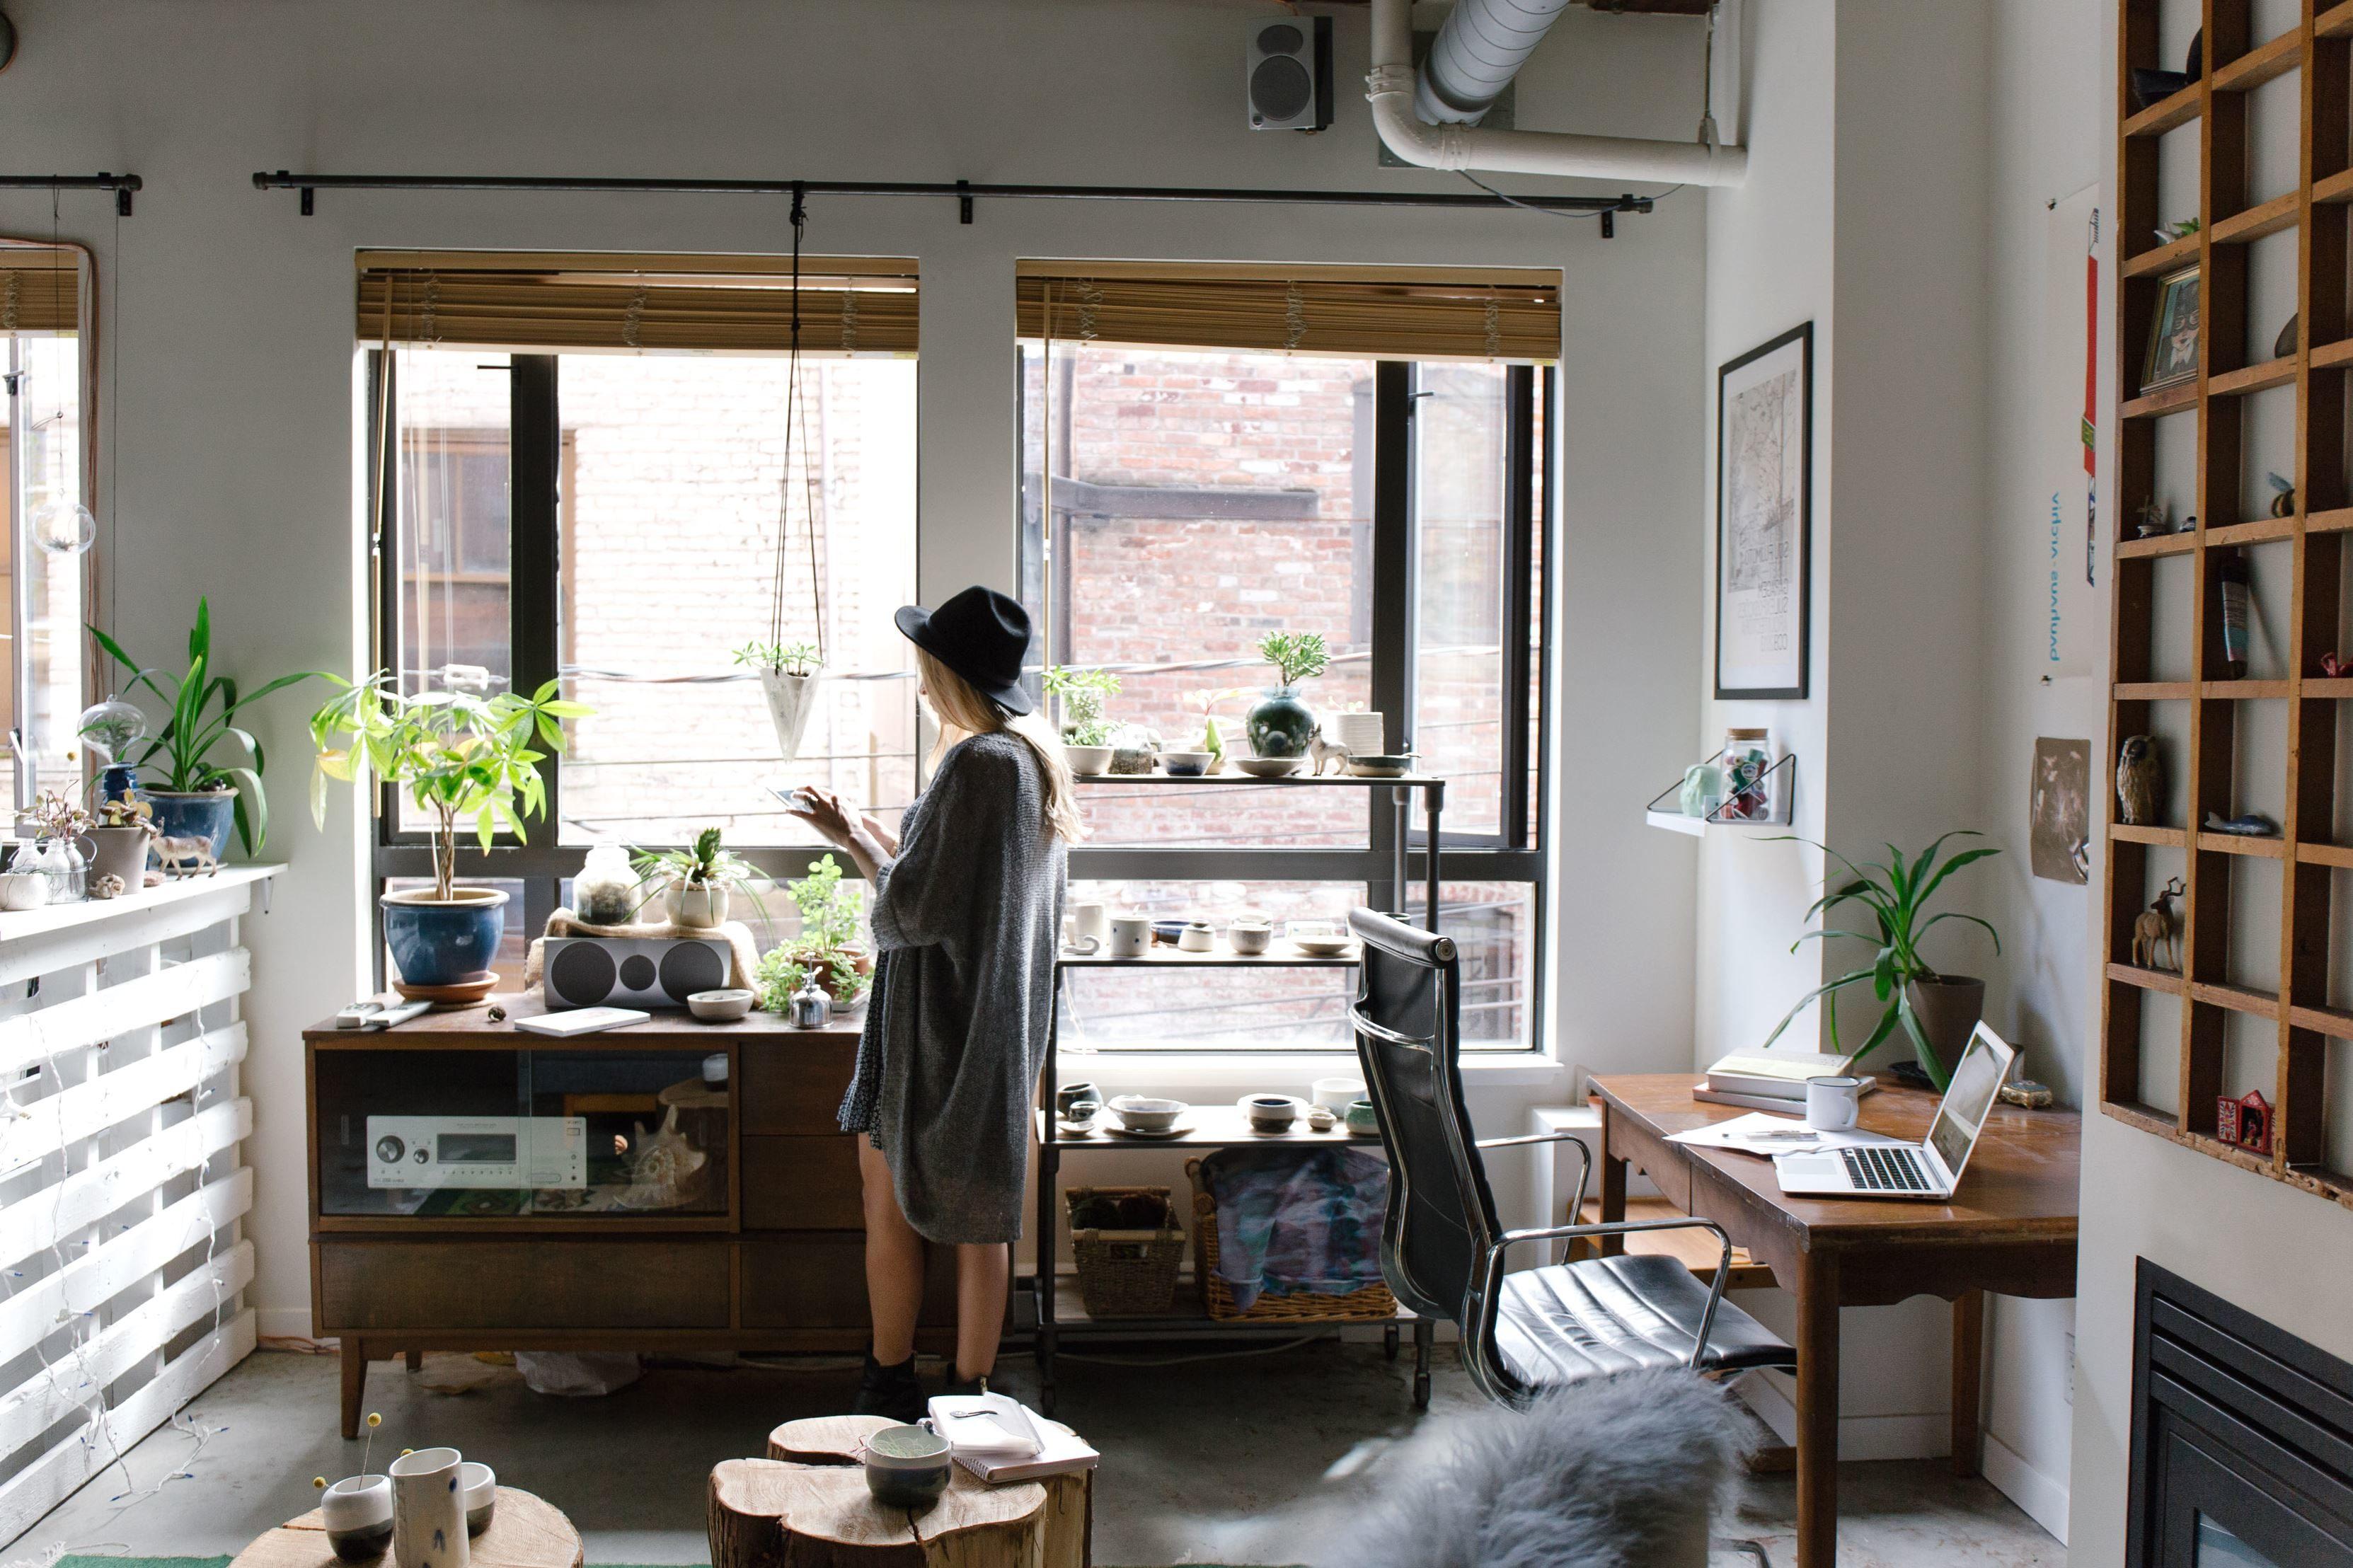 Imagen Gratis Windows Mujer Apartamento Mujer Casa